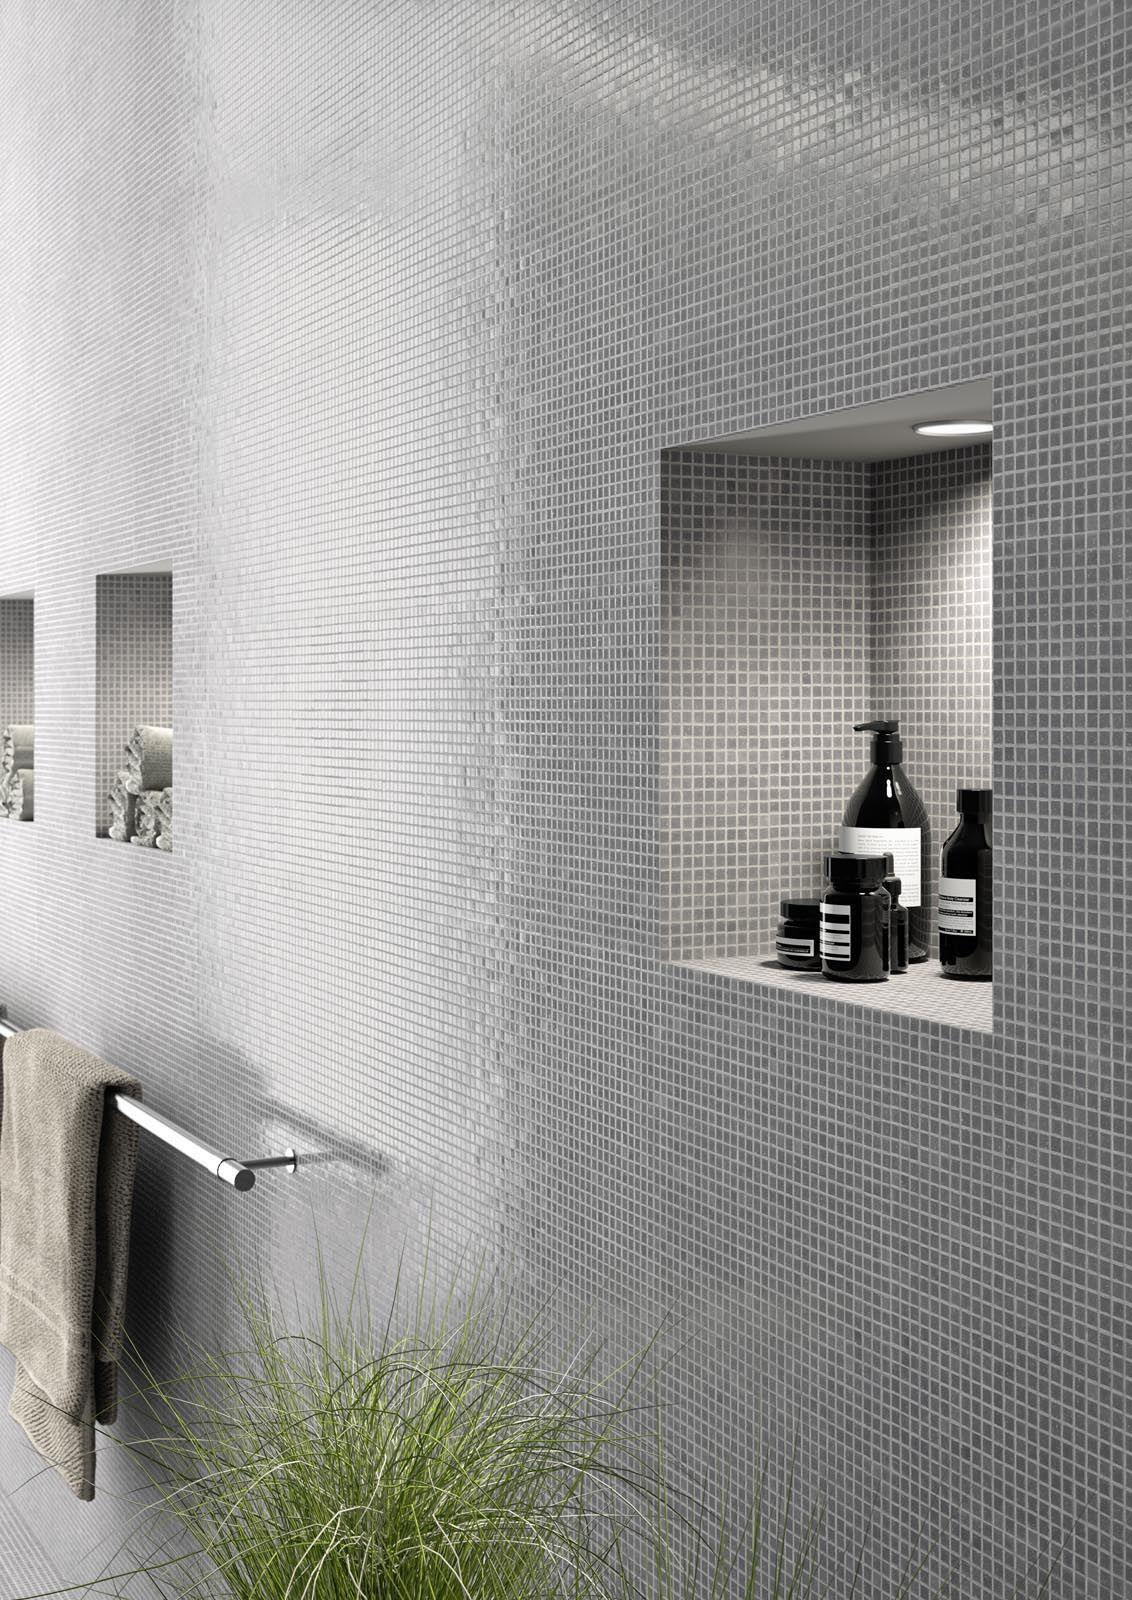 Glass Mosaic - glass mosaic tiles